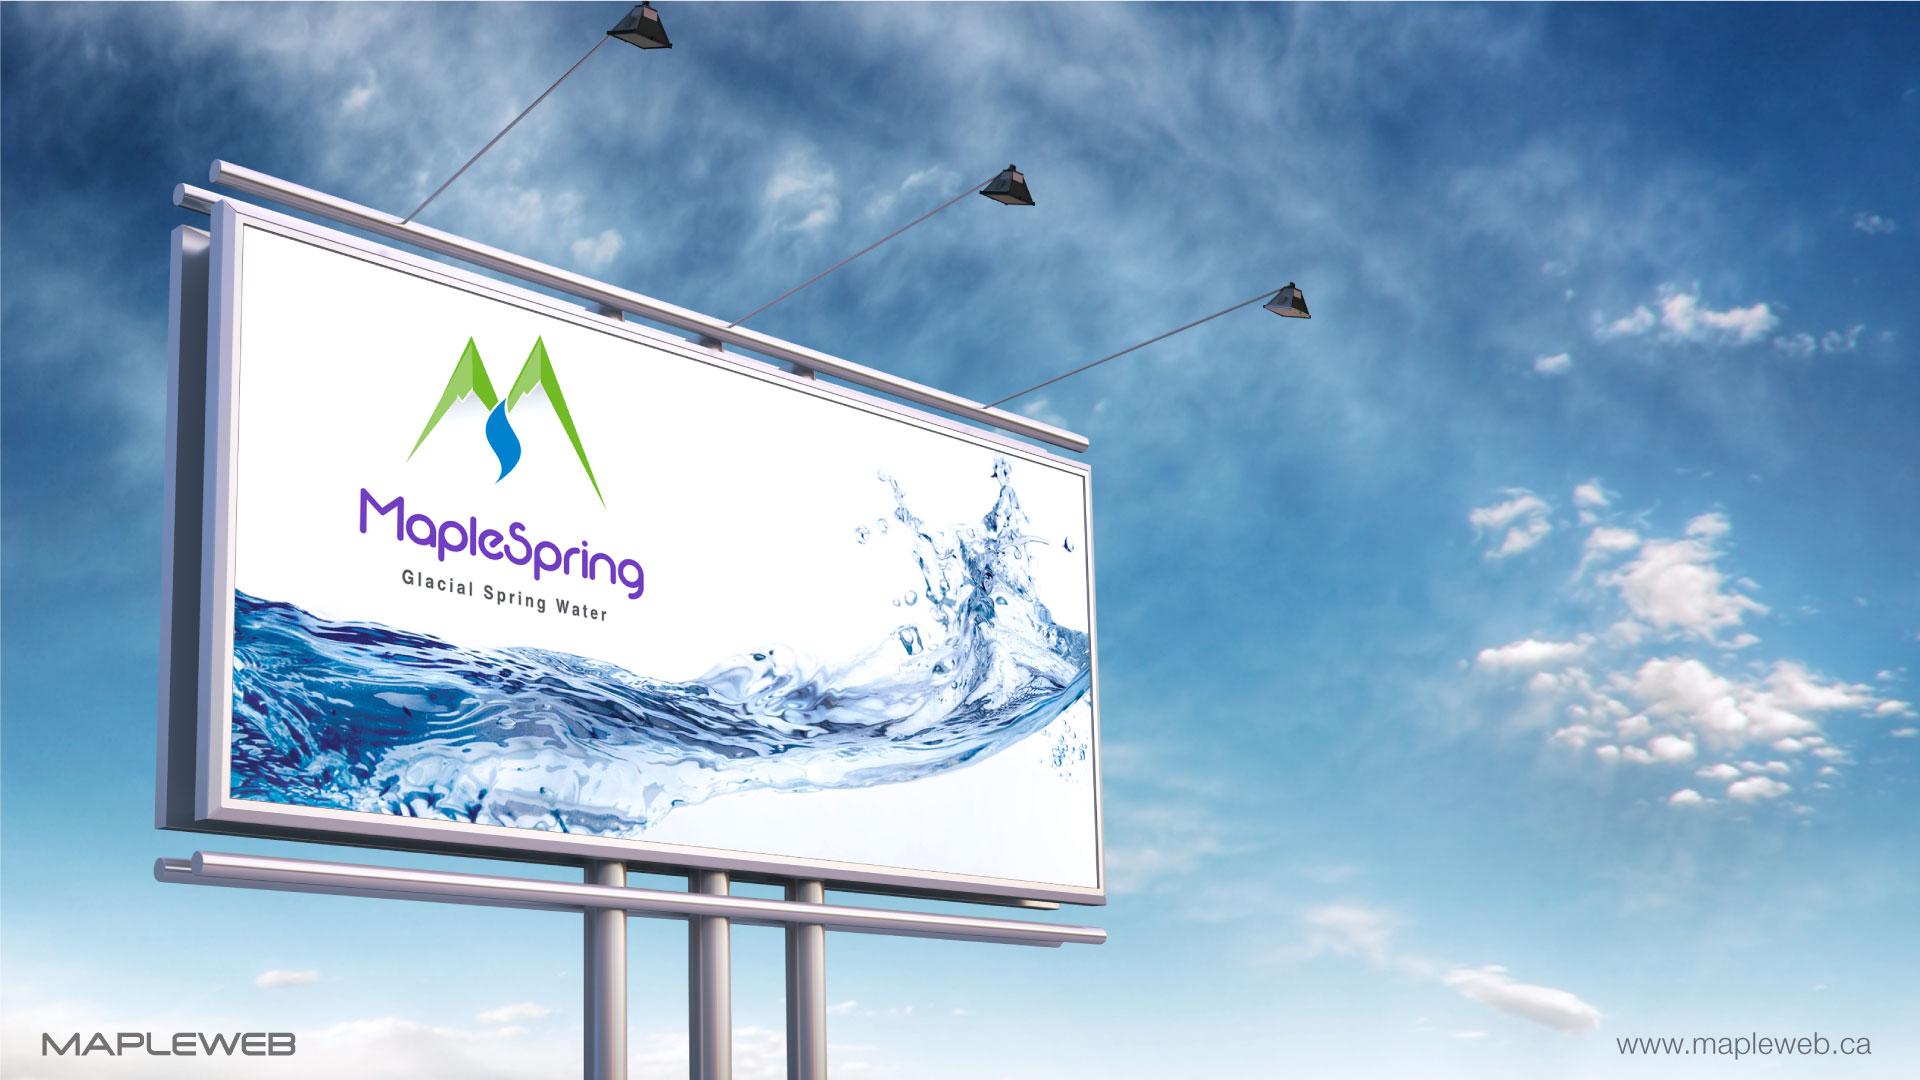 maplespring-brand-logo-design-by-mapleweb-vancouver-canada-billboard-mock